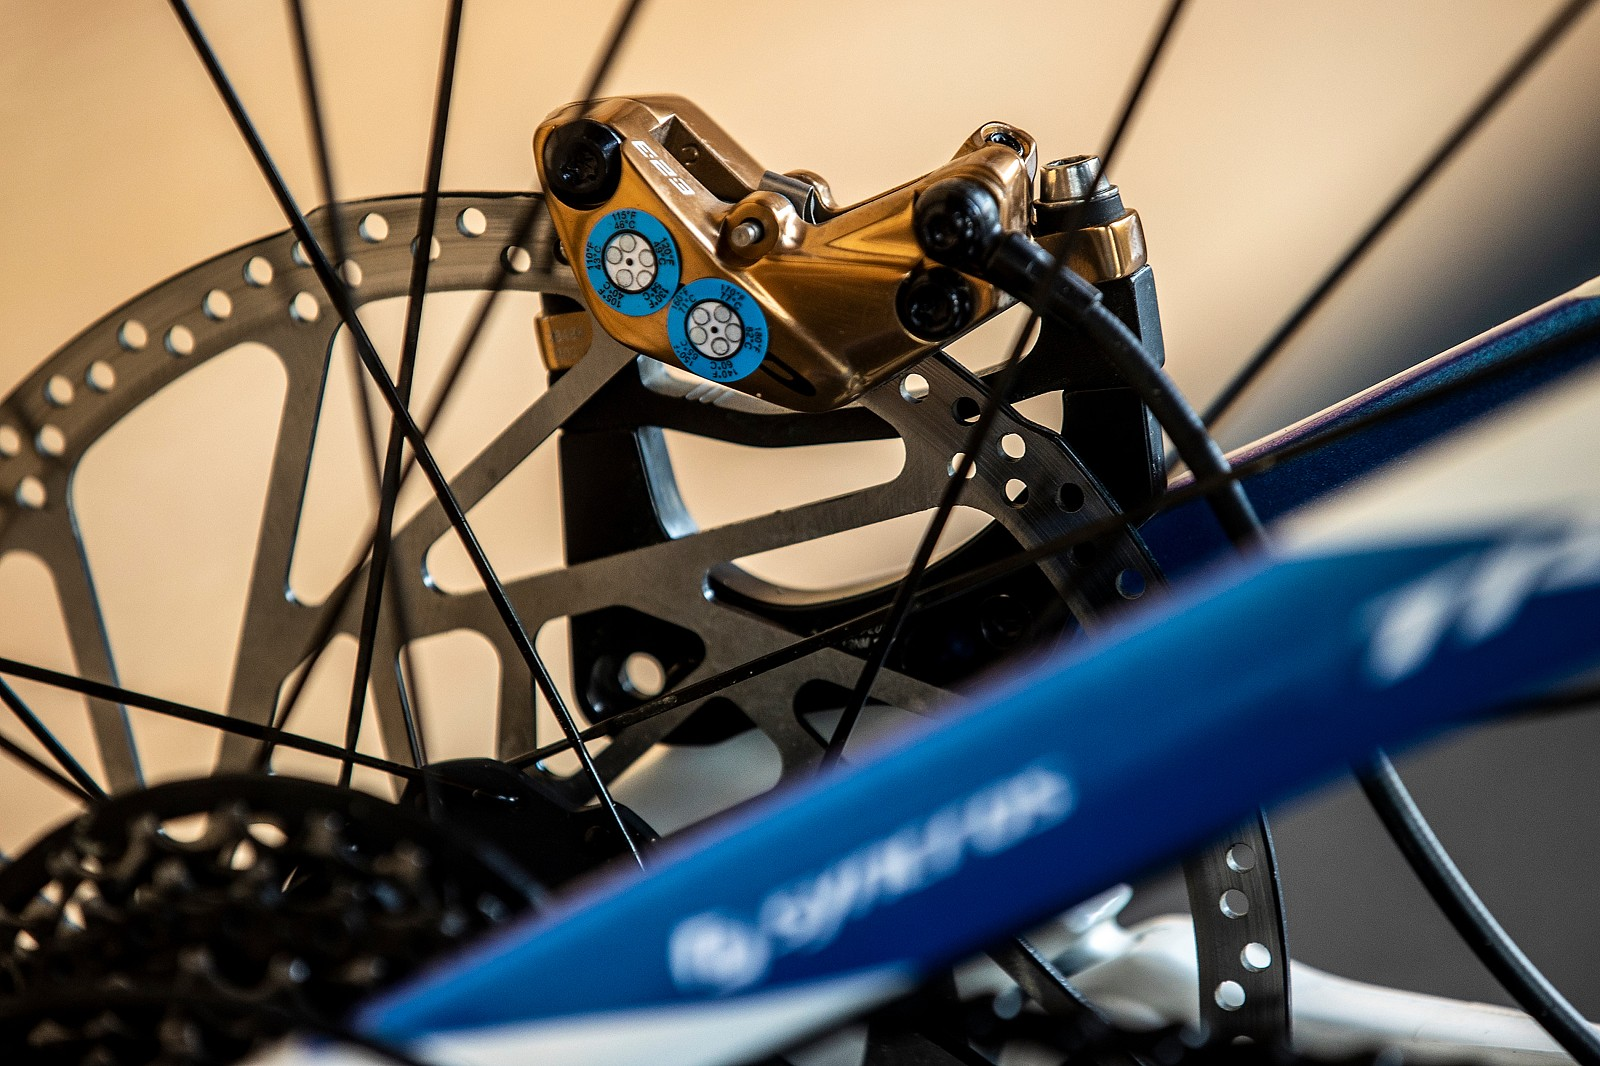 Thermometer Stickers on Her TRP Brakes - WORLD CHAMPS BIKE - Marine Cabirou's Scott Gambler - Mountain Biking Pictures - Vital MTB